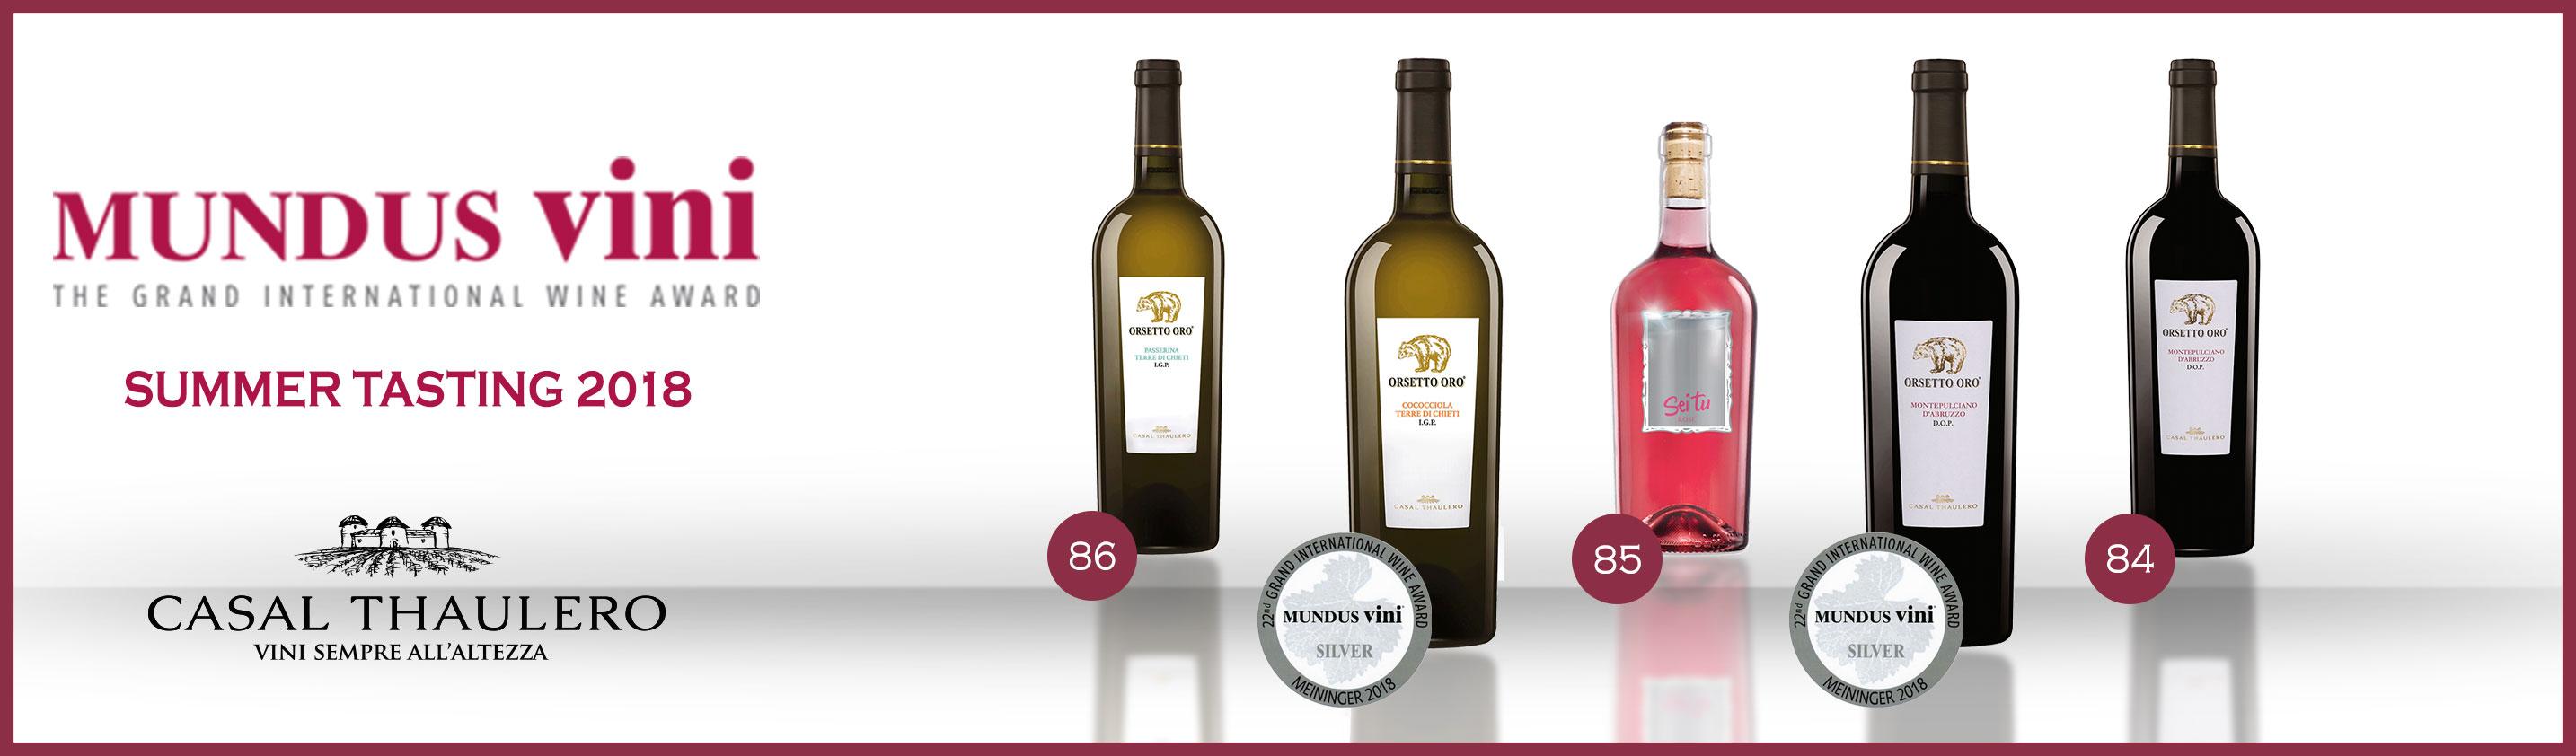 Premi Mundus Vini Summer Tasting 2018